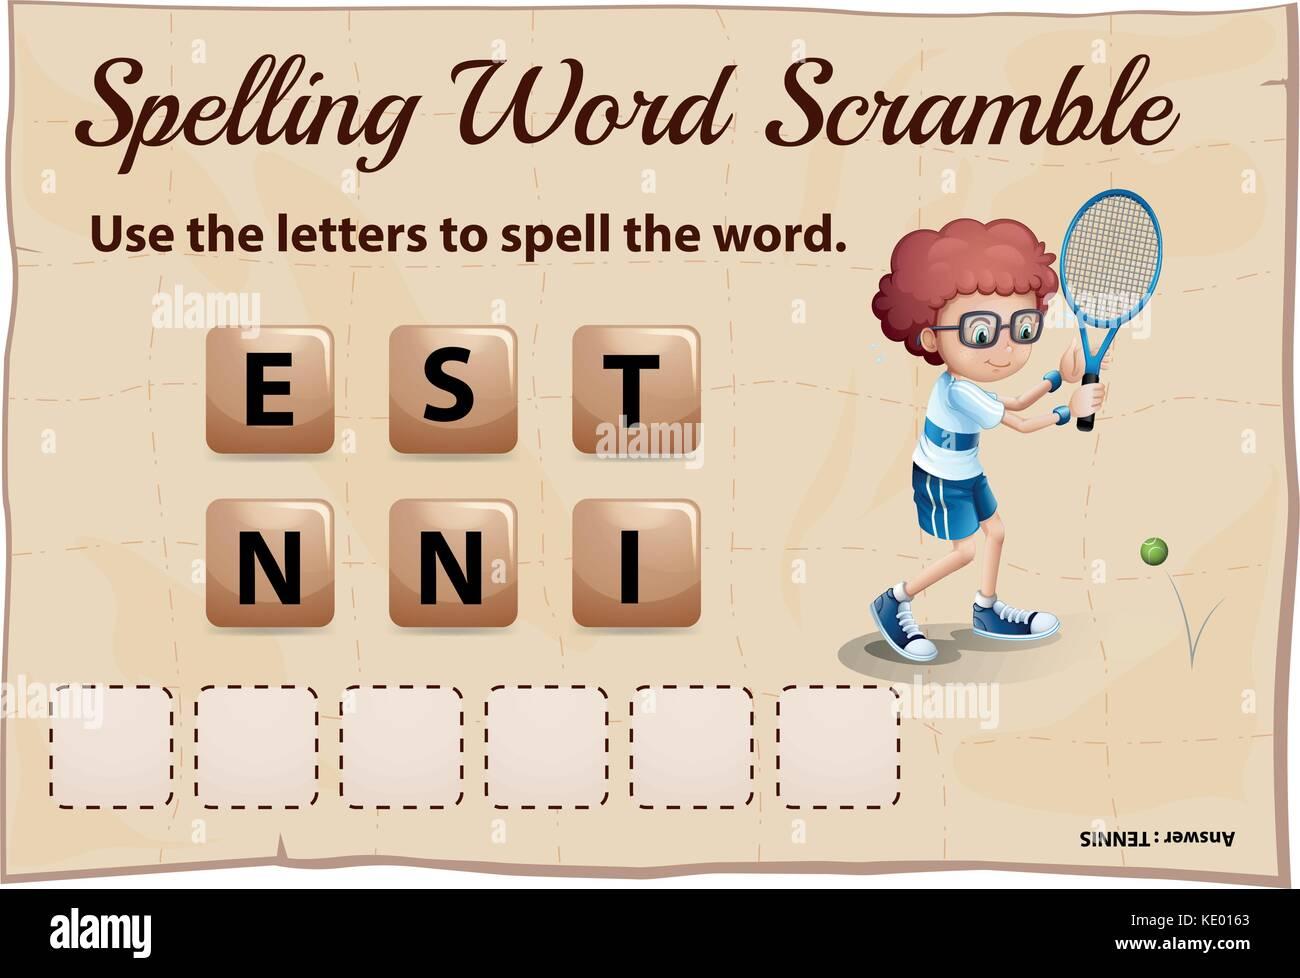 Tennis Word Stockfotos & Tennis Word Bilder - Seite 2 - Alamy